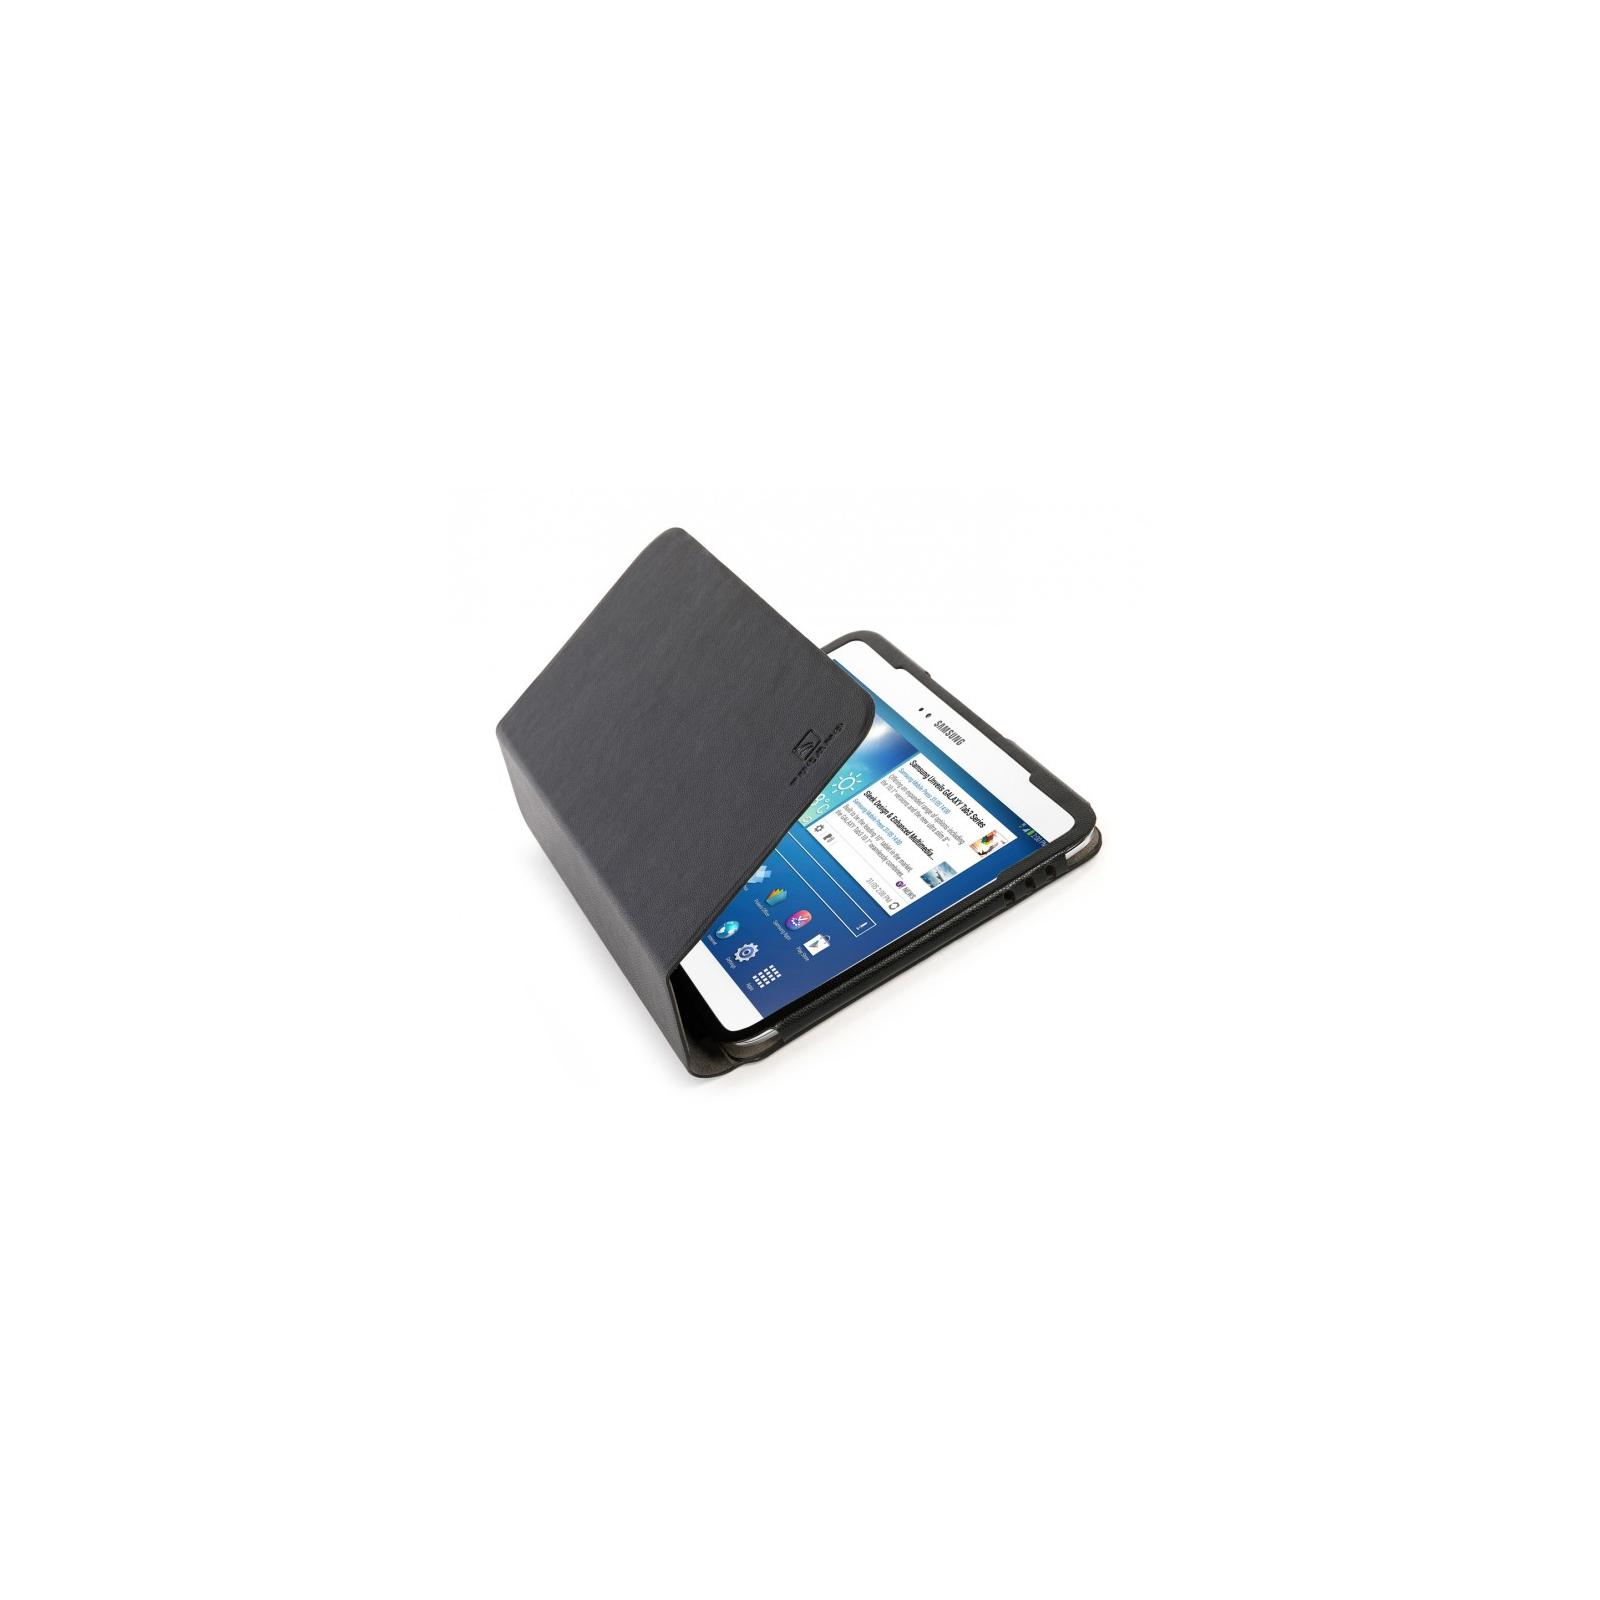 Чехол для планшета Tucano Galaxy Tab 3 10.1 Leggero Black (TAB-LS310) изображение 5